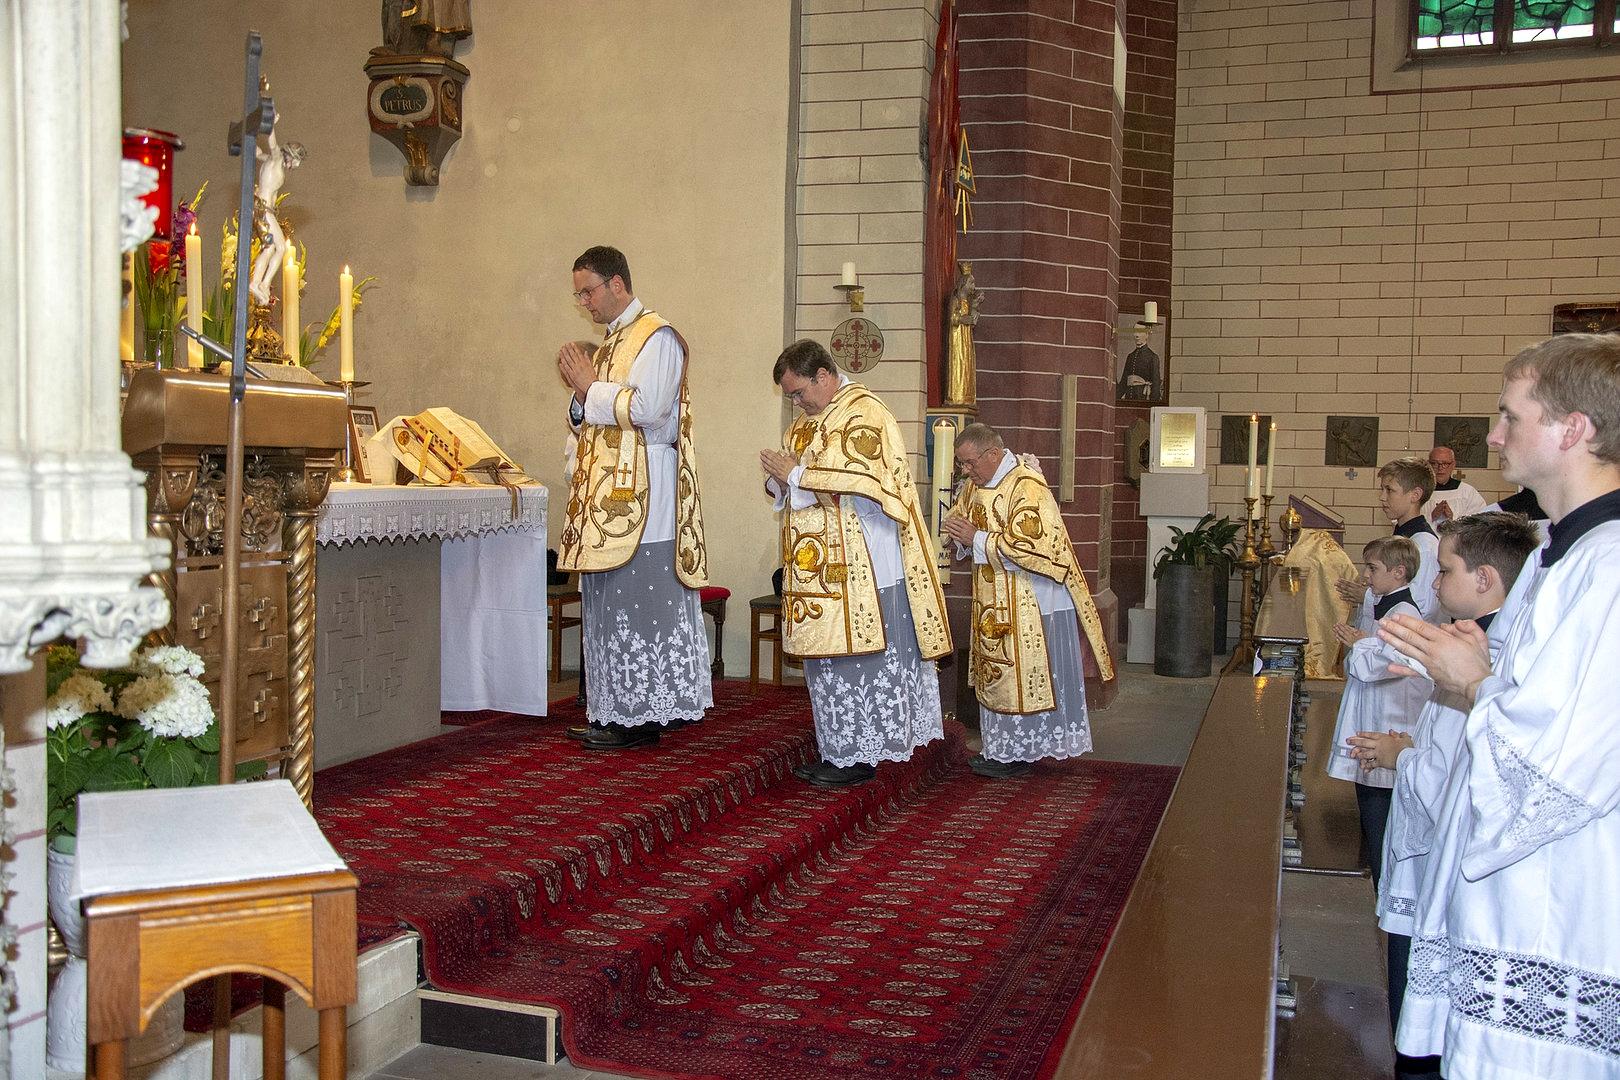 Missa Solemnis in Paderborn